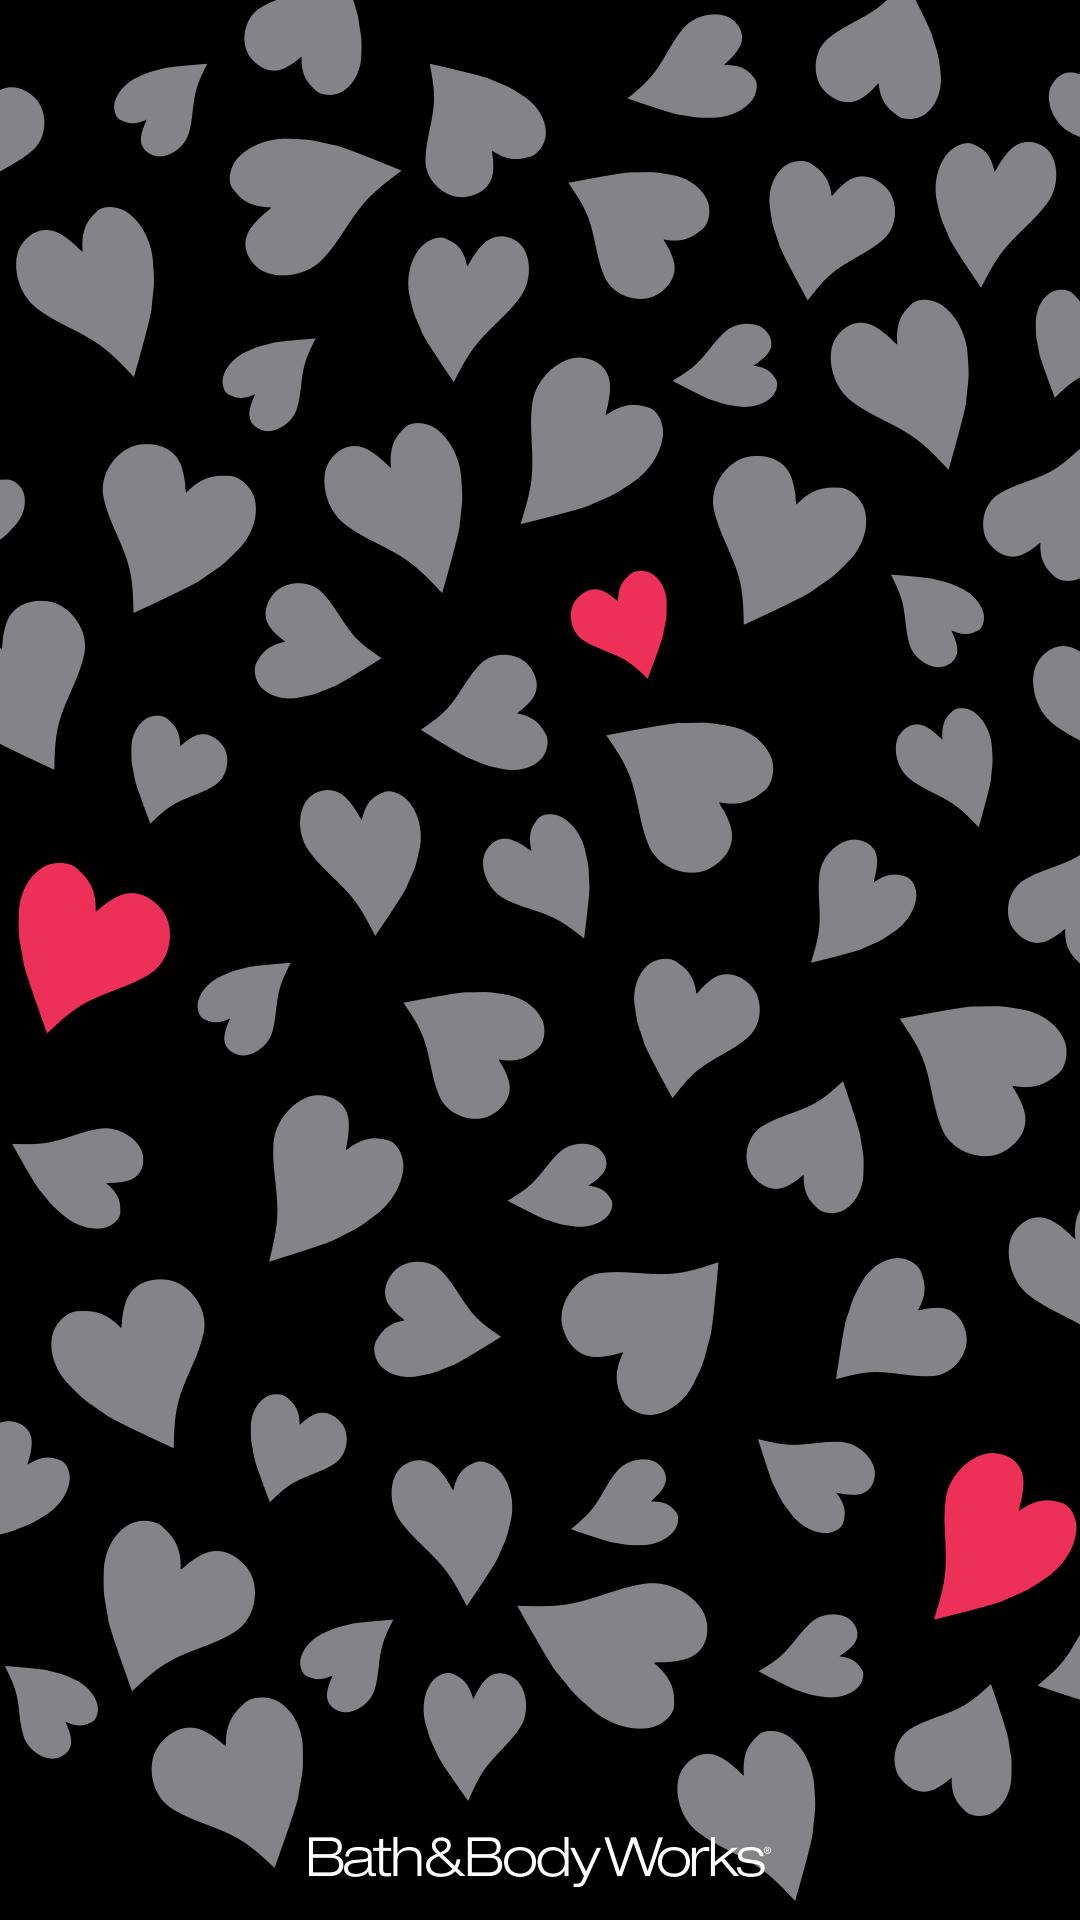 Black Heart Iphone Wallpaper Heart Iphone Wallpaper Heart Wallpaper Romantic Wallpaper